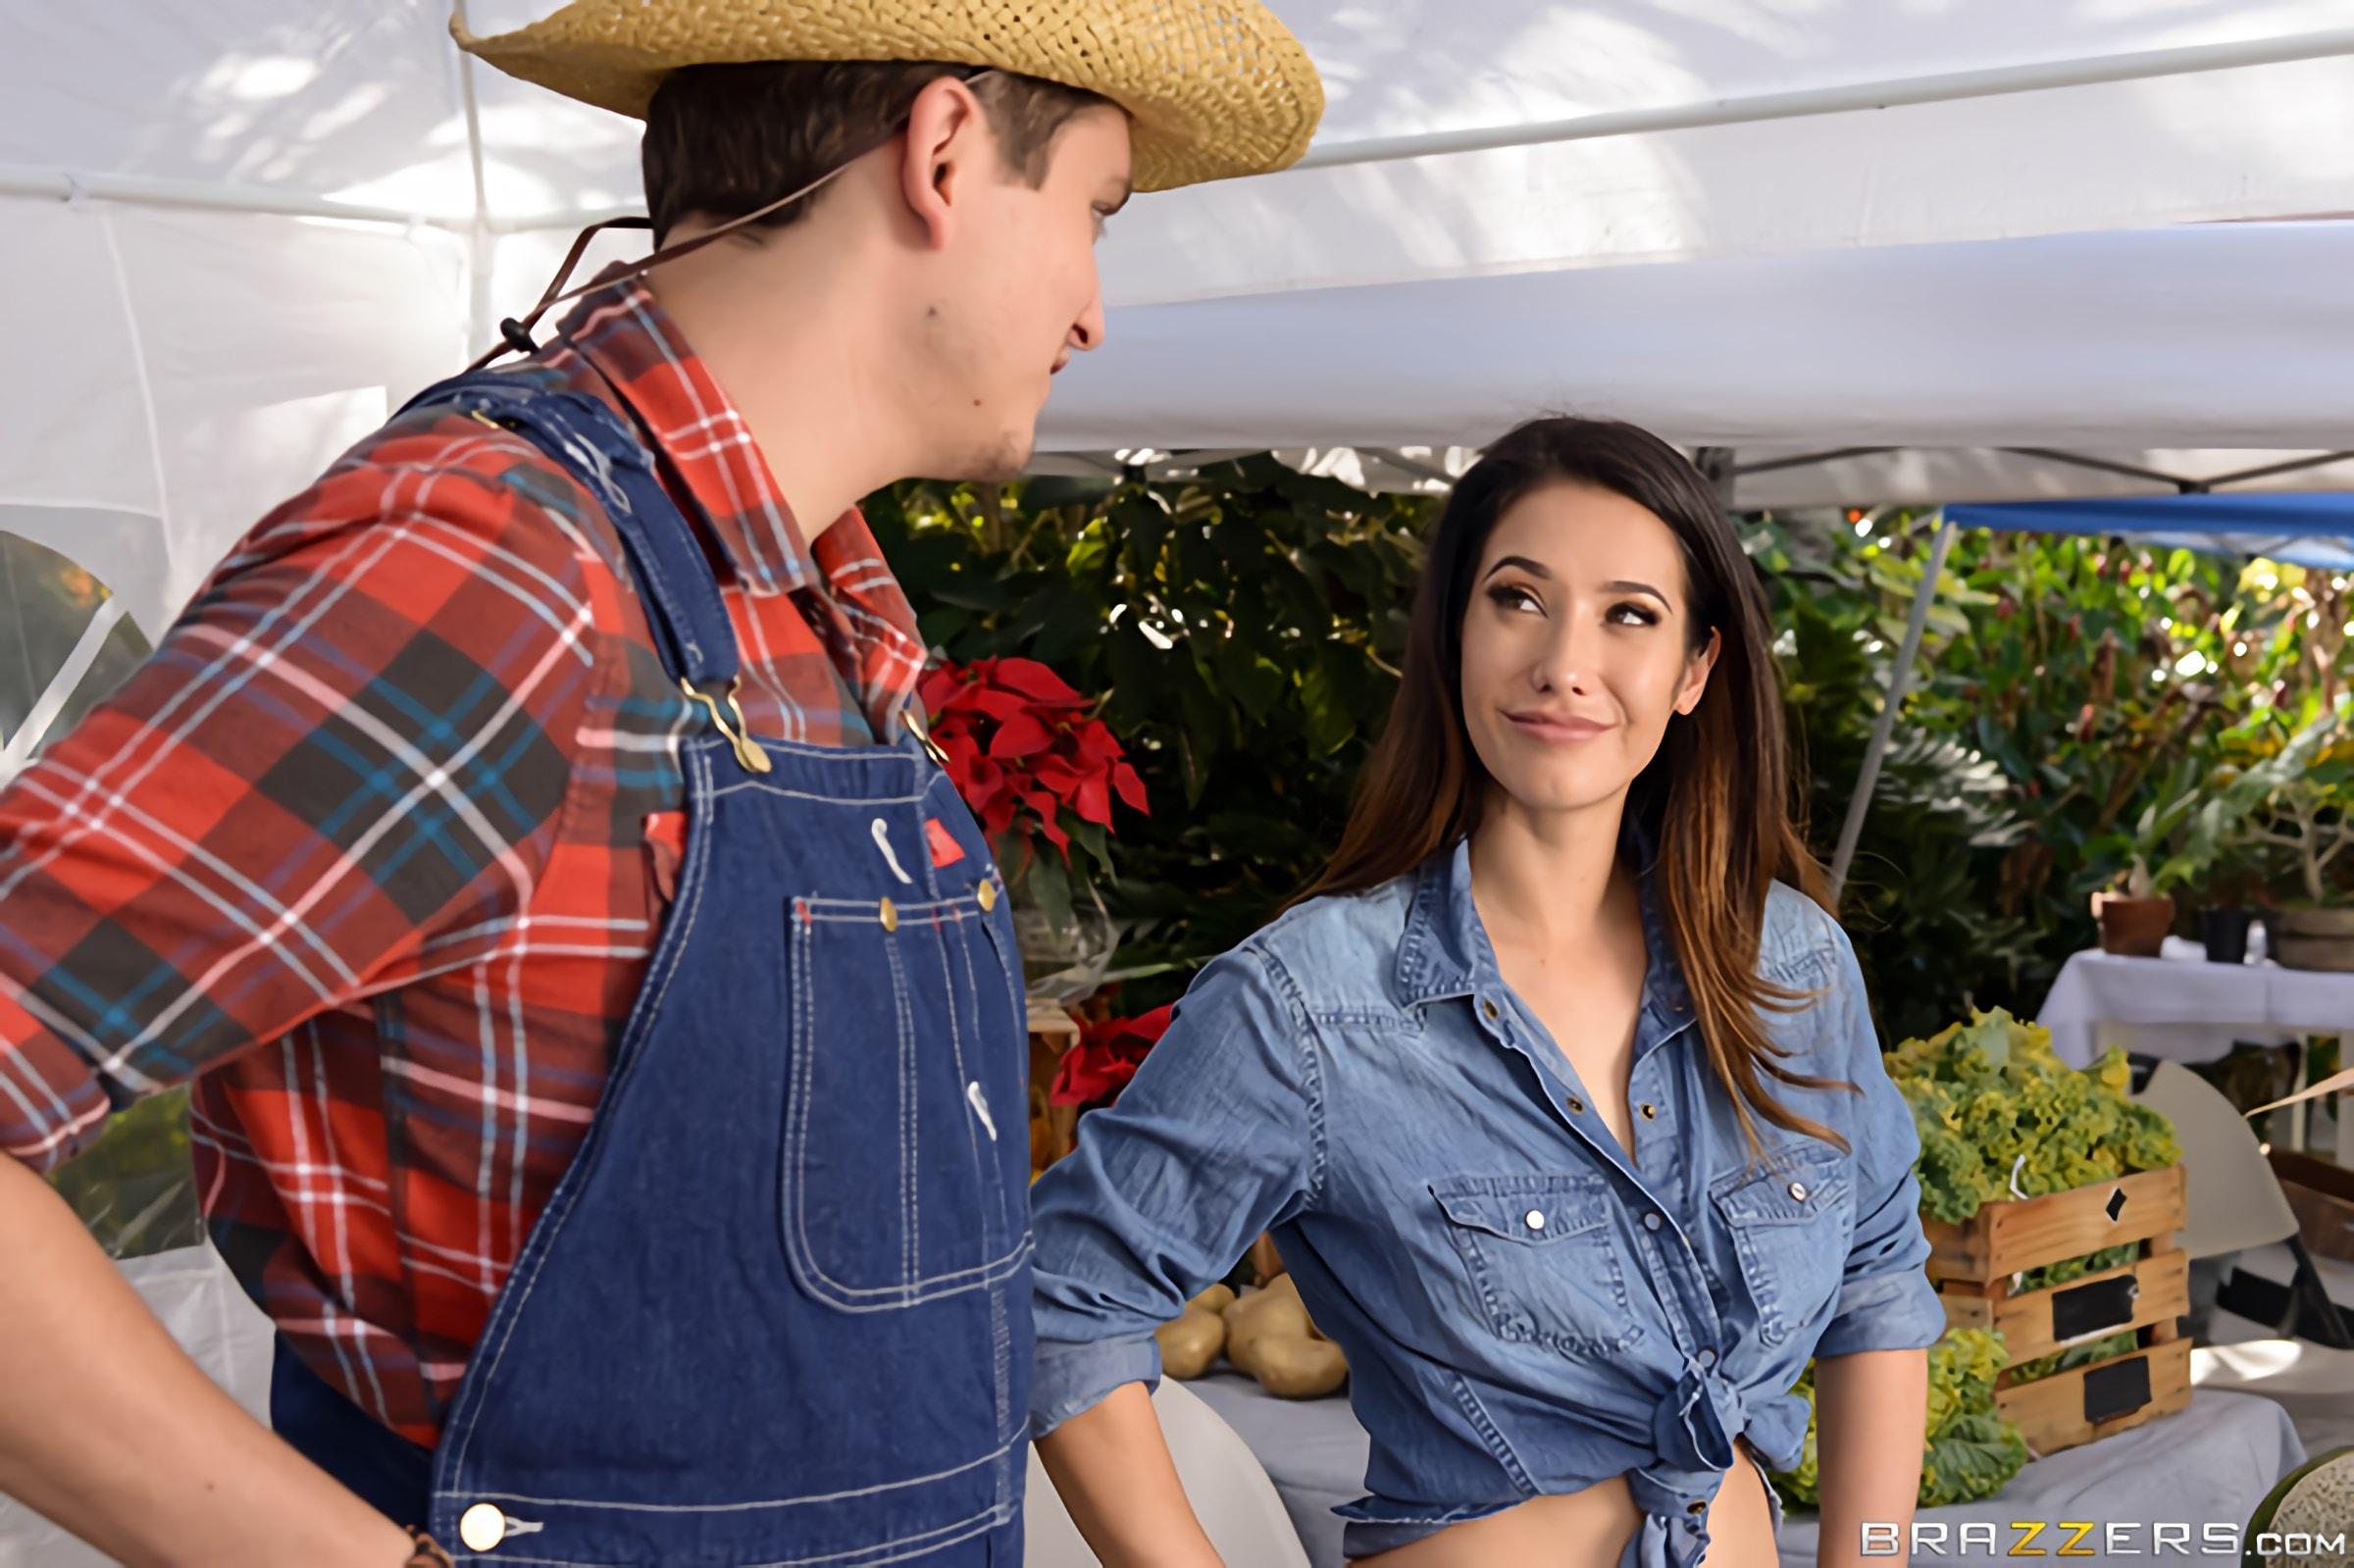 Brazzers 'The Farmers Wife' starring Eva Lovia (Photo 1)